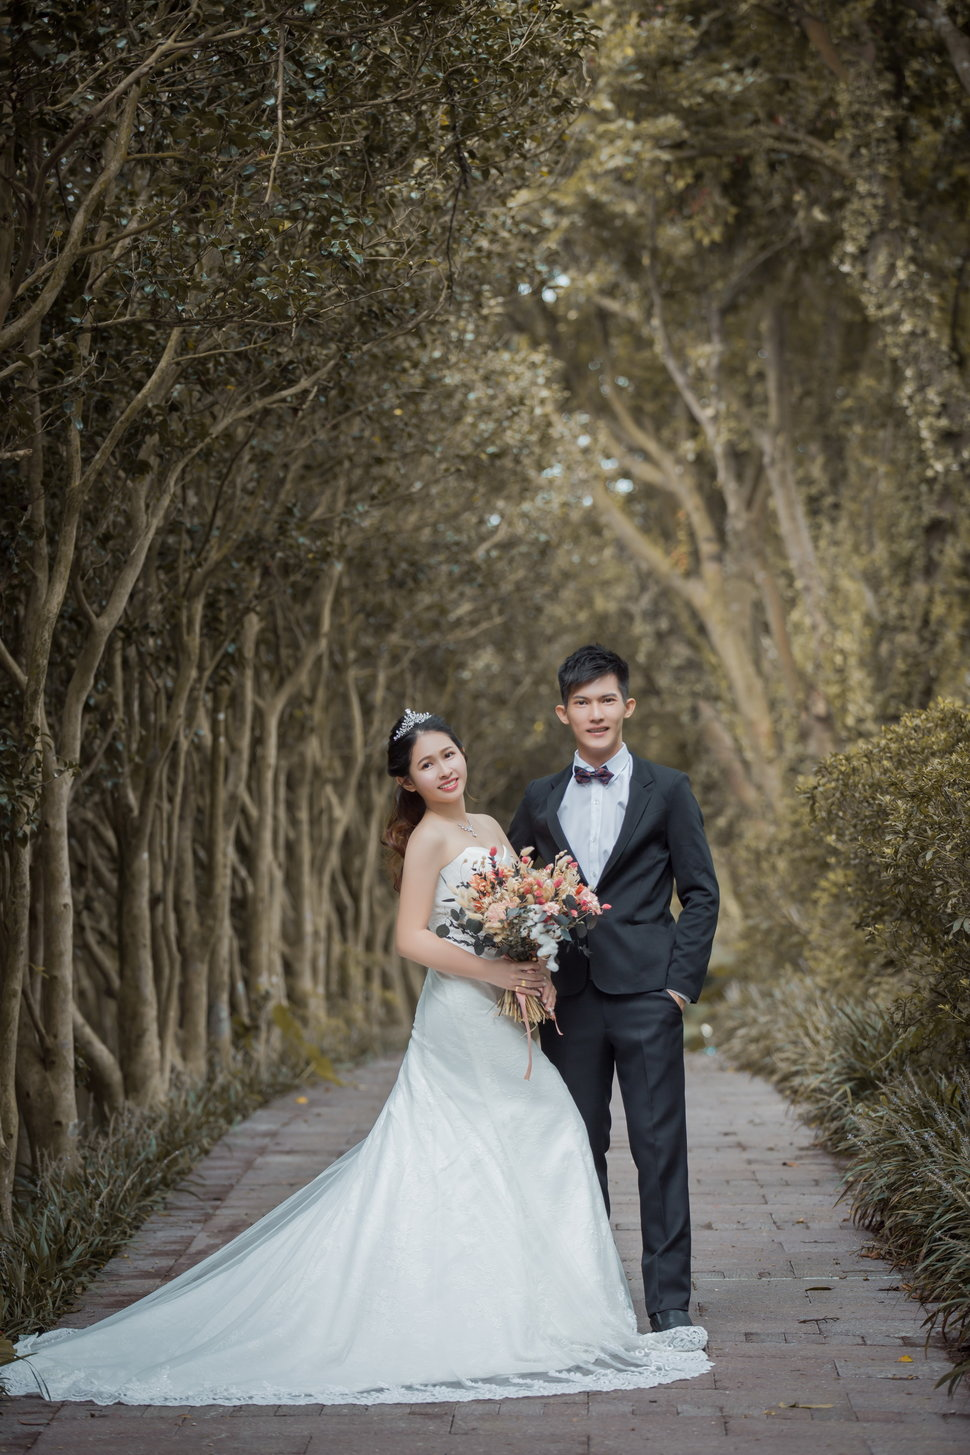 PP-0241_調整大小 - 巴黎婚紗攝影台灣總店 - 結婚吧